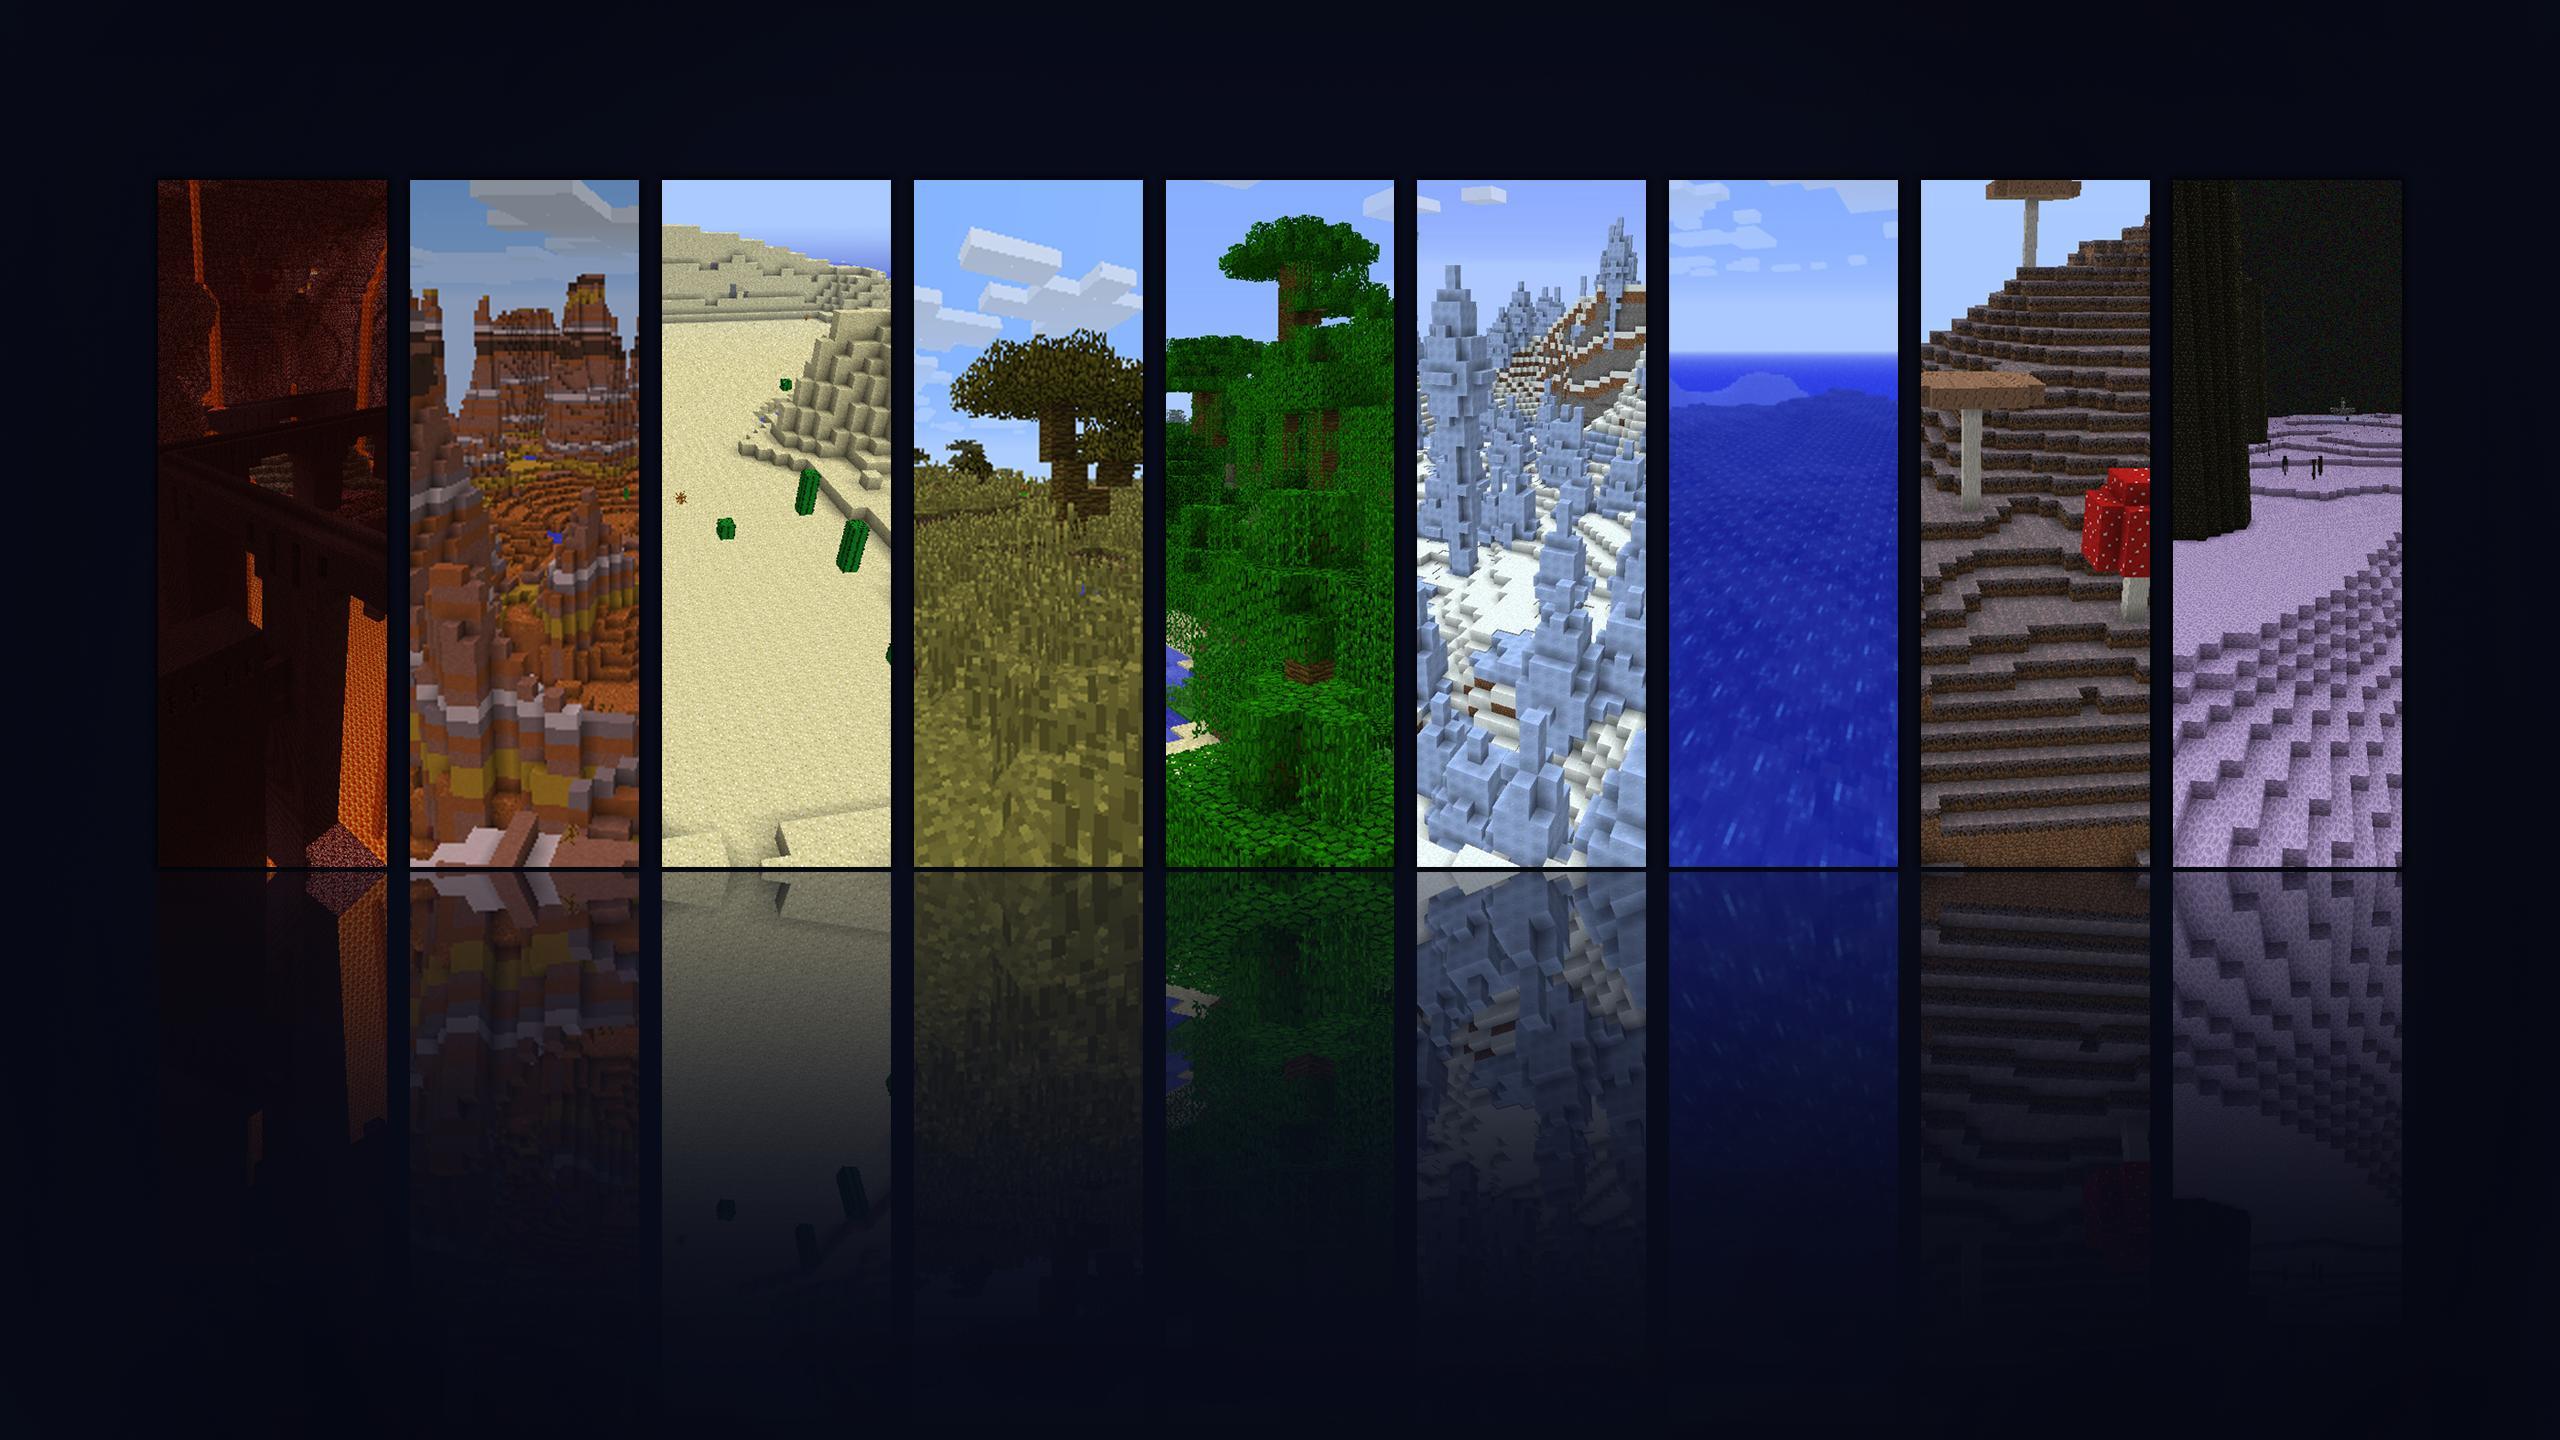 2560X1440 Minecraft Wallpapers   Top 2560X1440 Minecraft 2560x1440